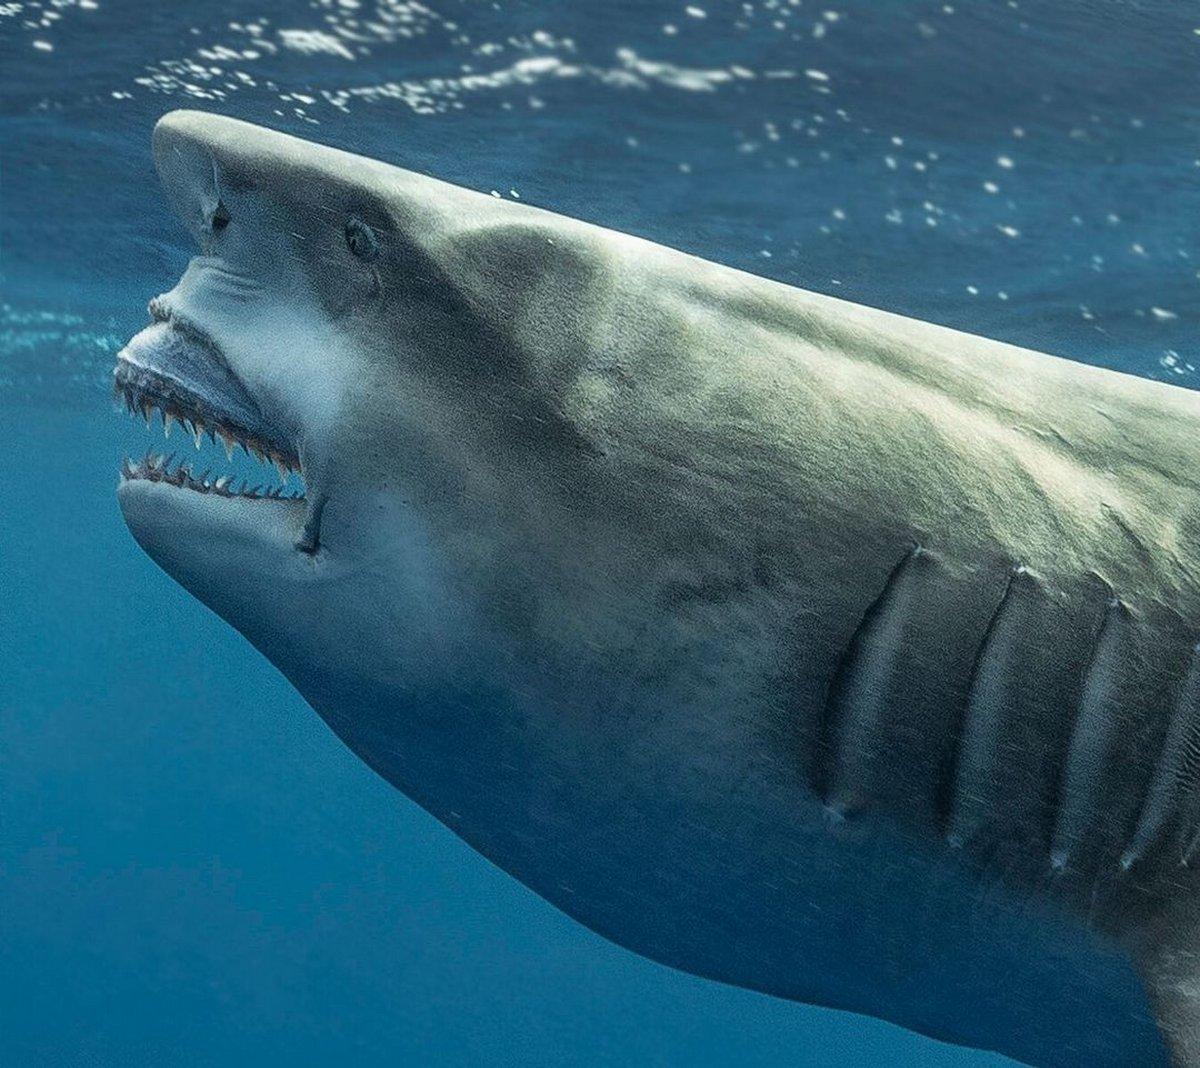 Un requin qui ressemble à Donald Trump aperçu en Floride